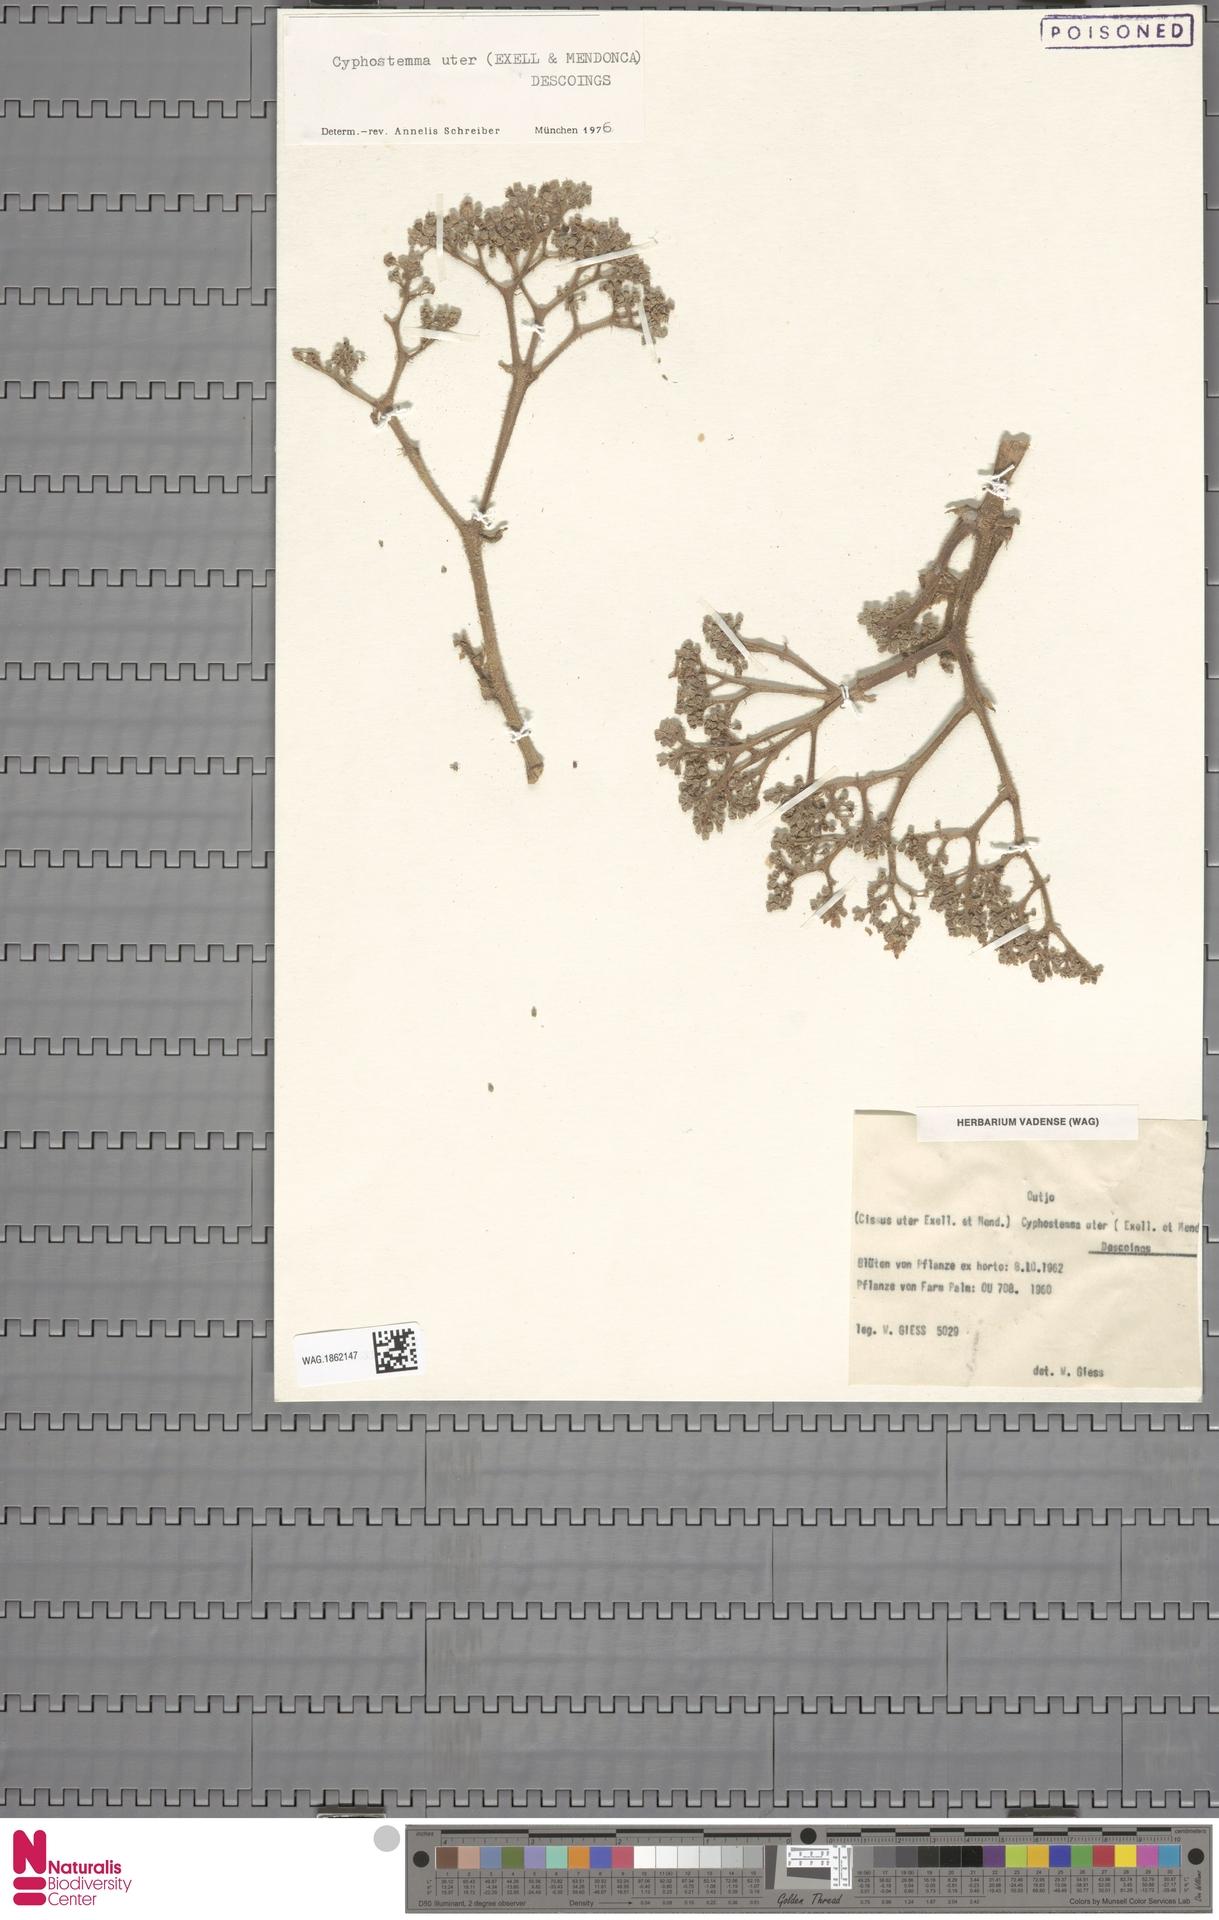 WAG.1862147 | Cyphostemma uter (Exell & Mendonça) Desc.